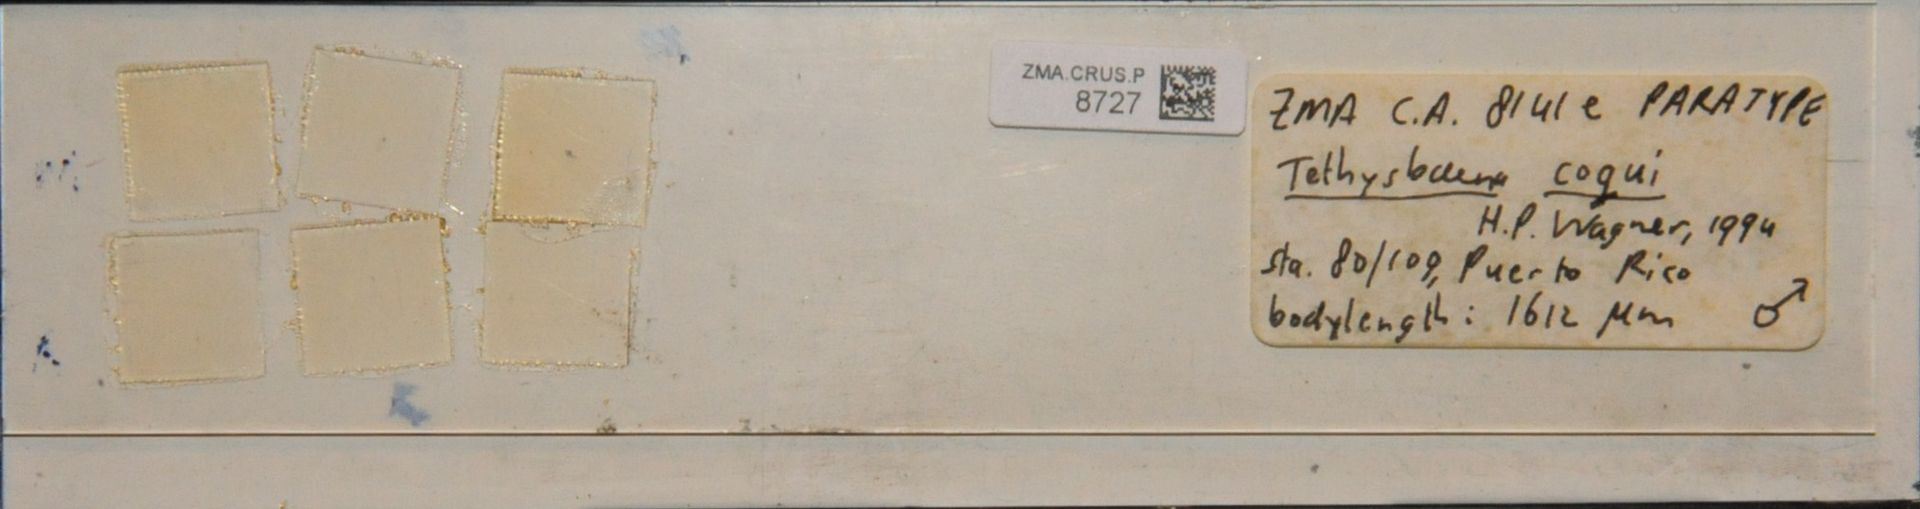 ZMA.CRUS.P.8727 | Tethysbaena coqui H.P. Wagner, 1994